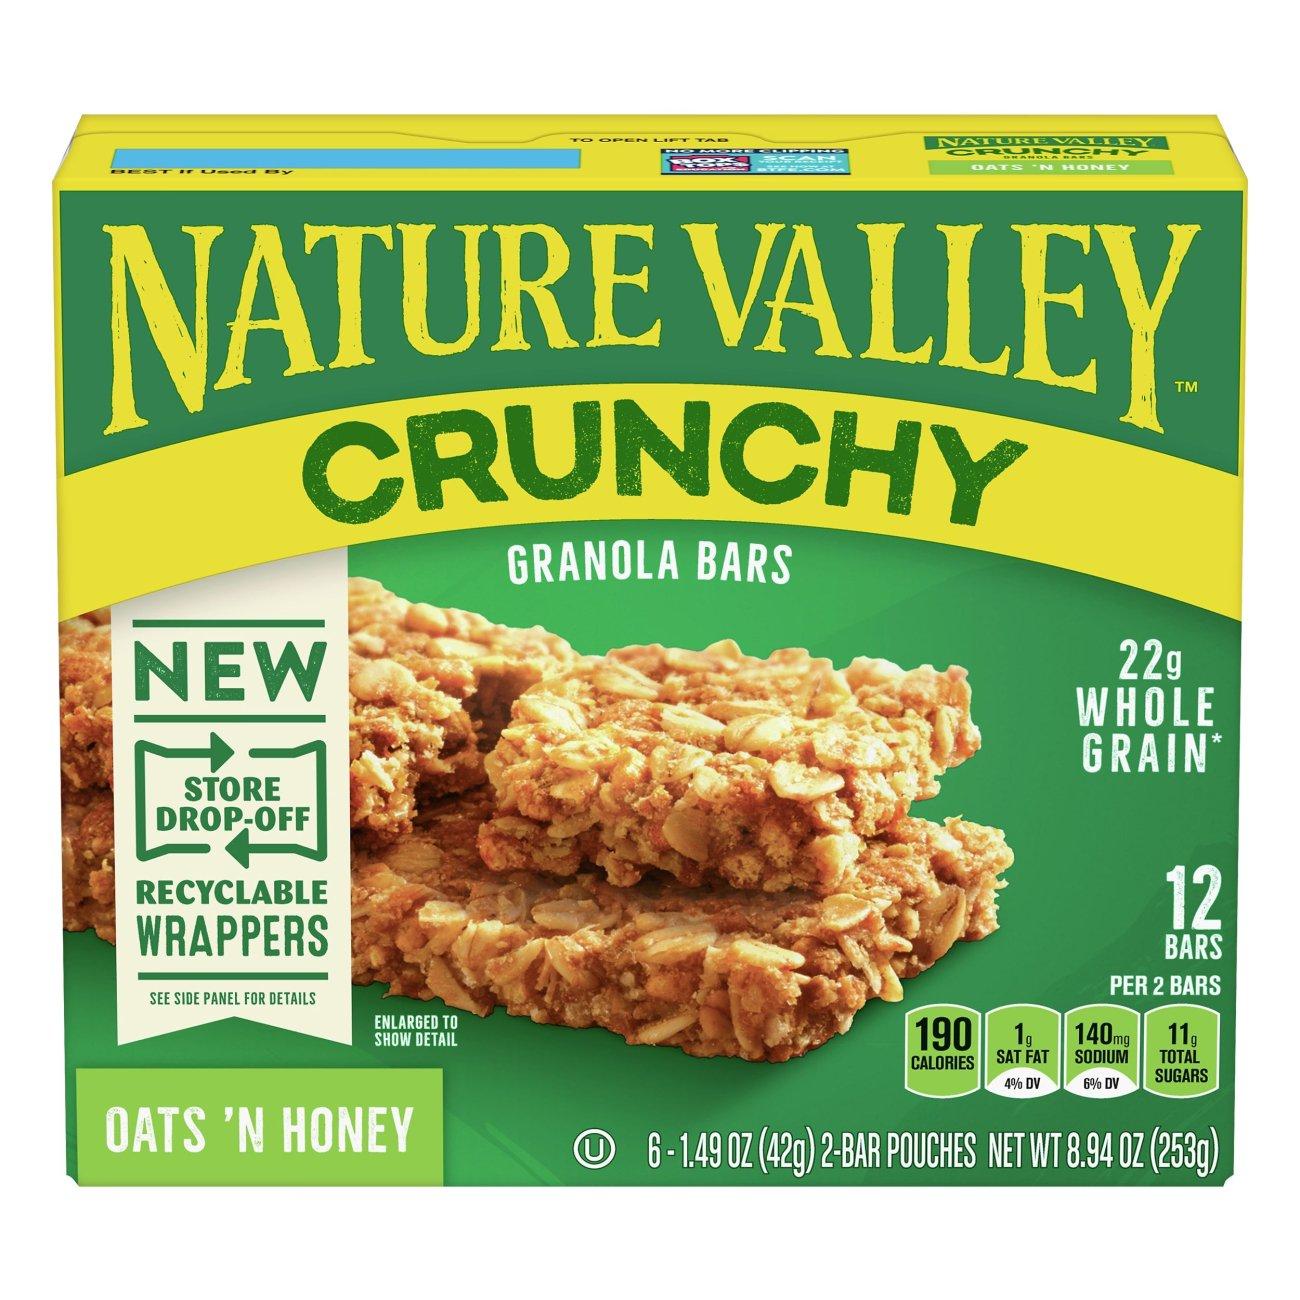 Nature Valley Crunchy Oats 'n Honey